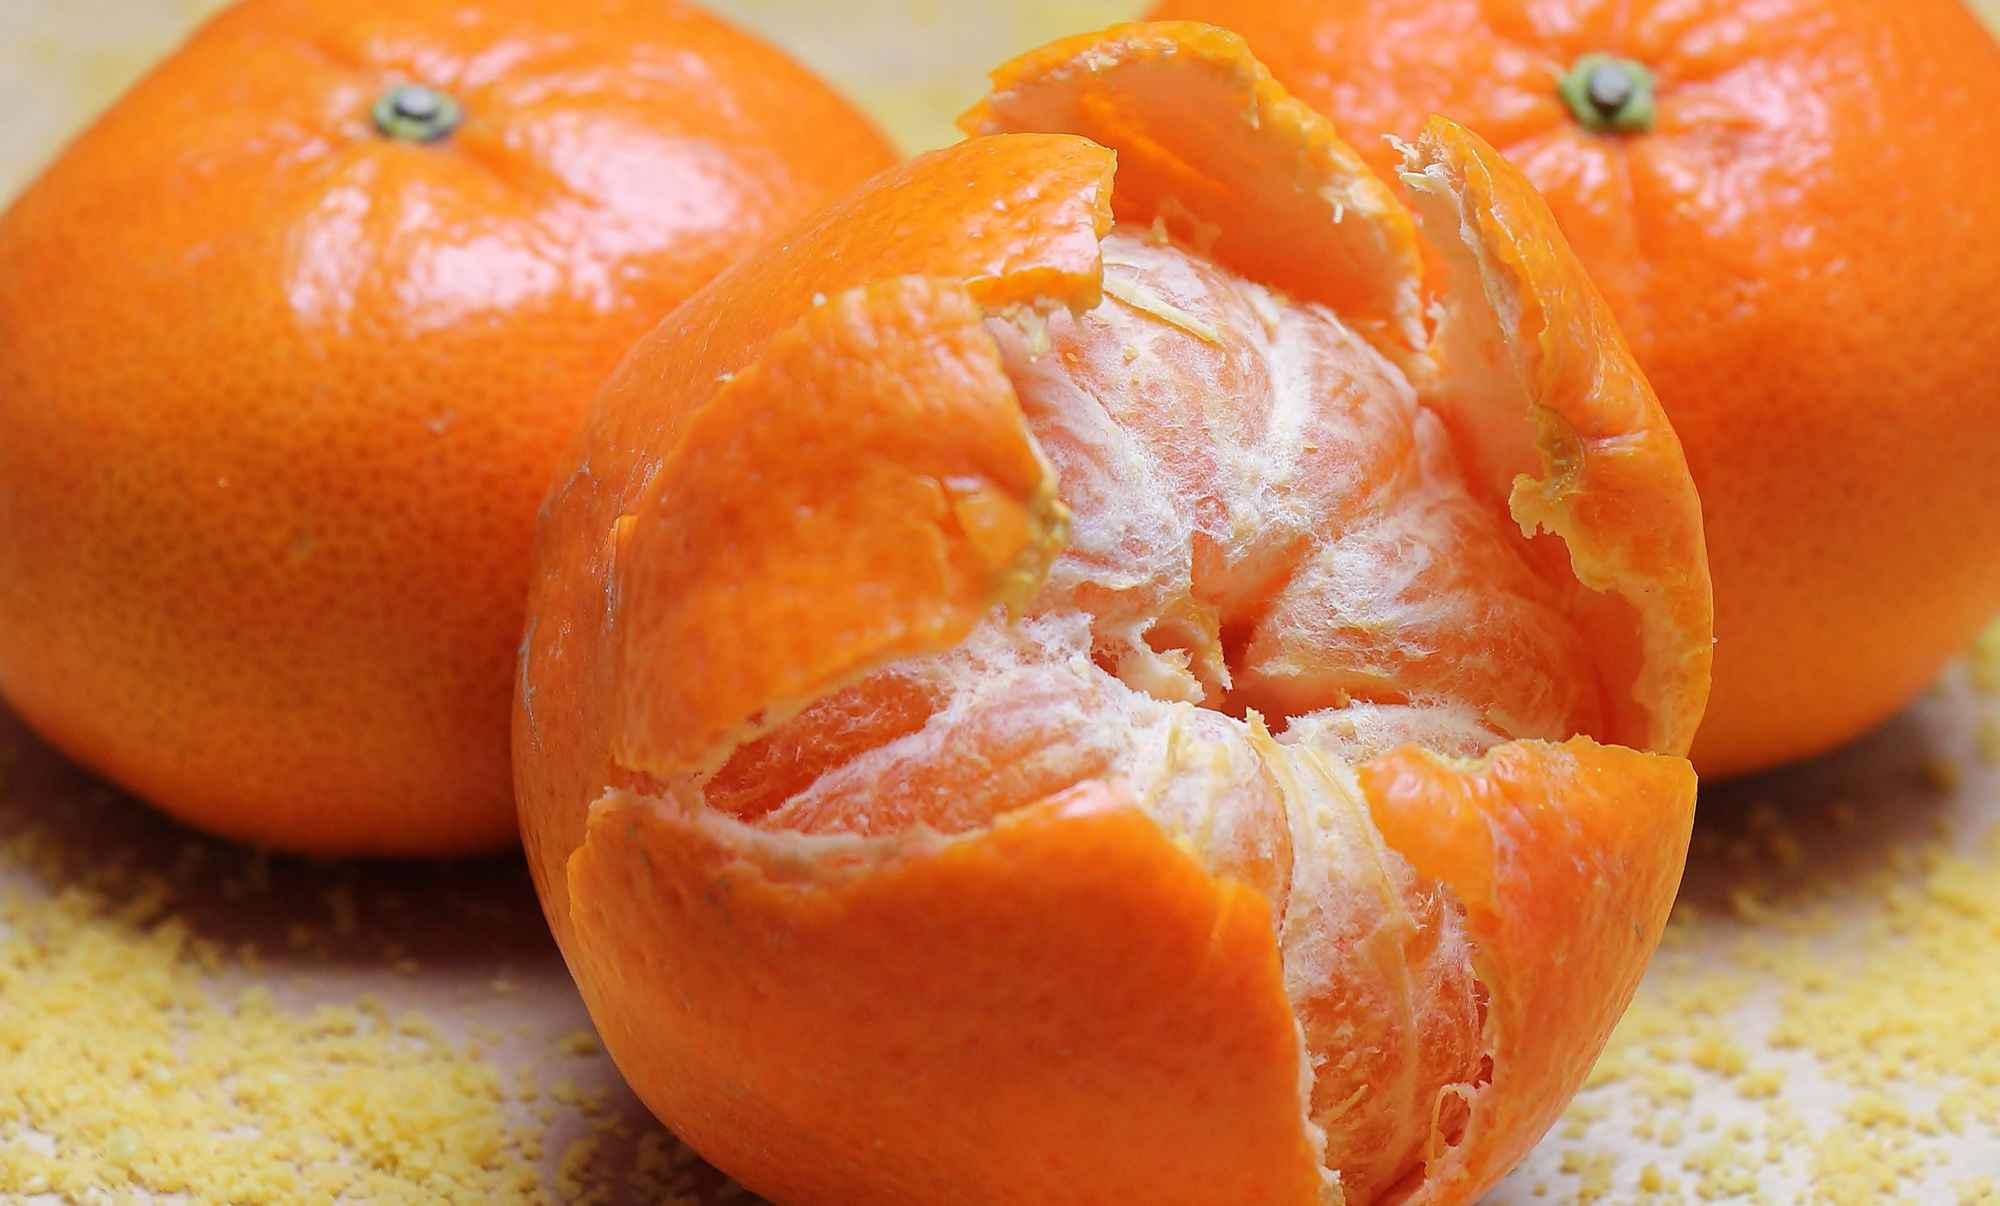 Rezept für Mandarinen-Tonka-Creme